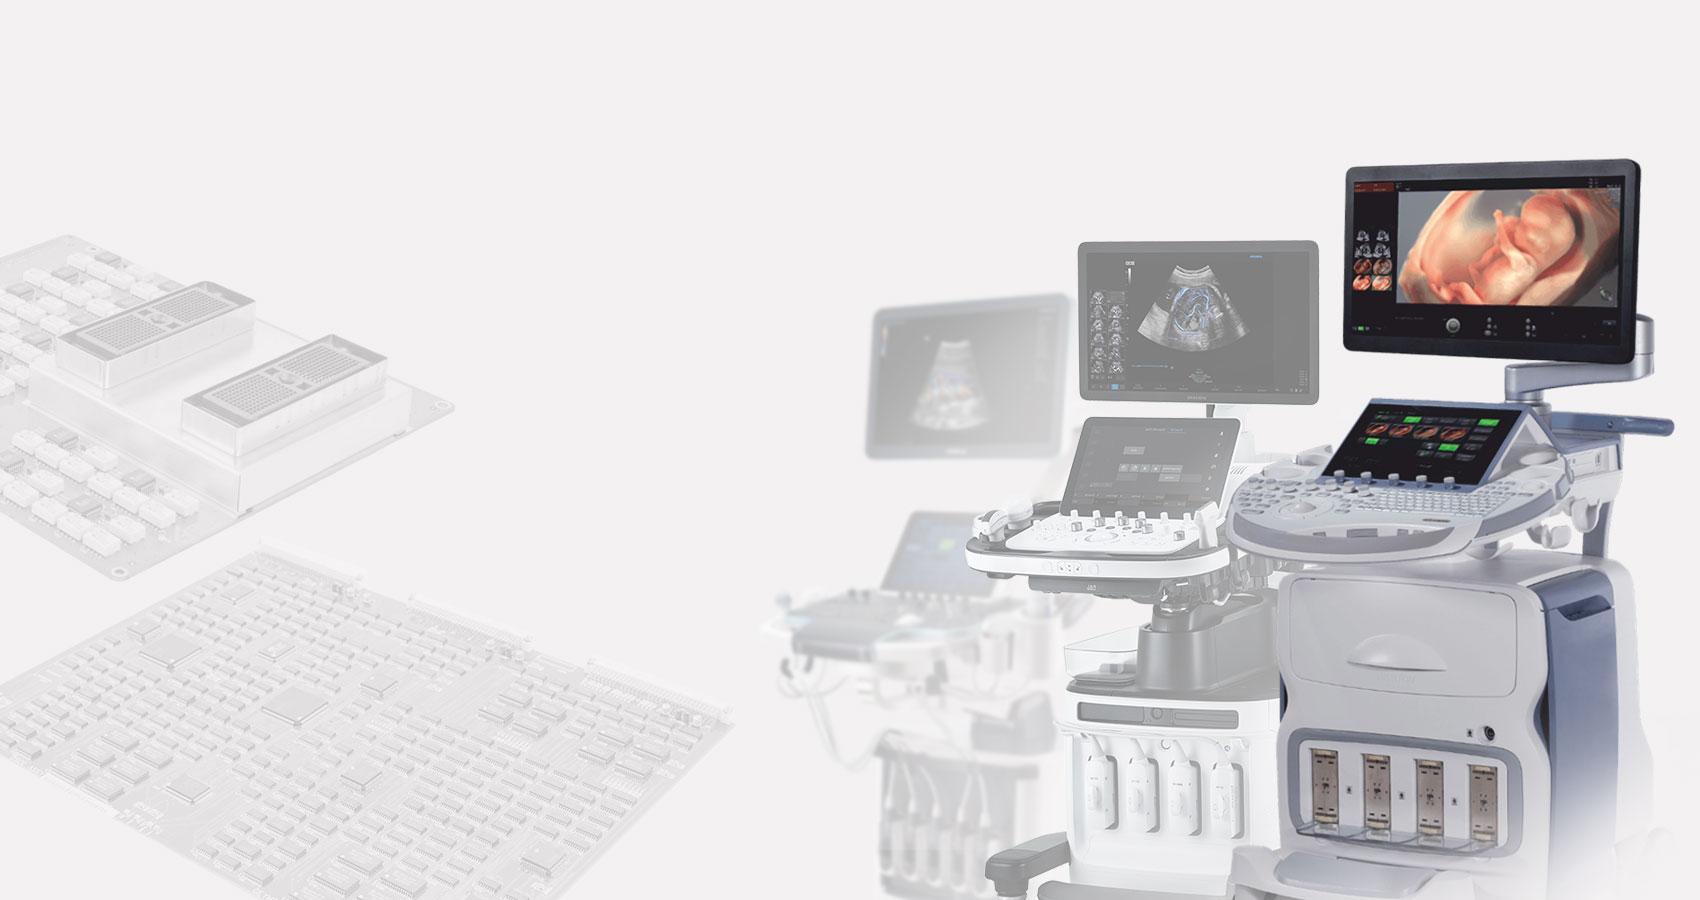 Ремонт электронных плат УЗИ аппарата на компонентном уровне